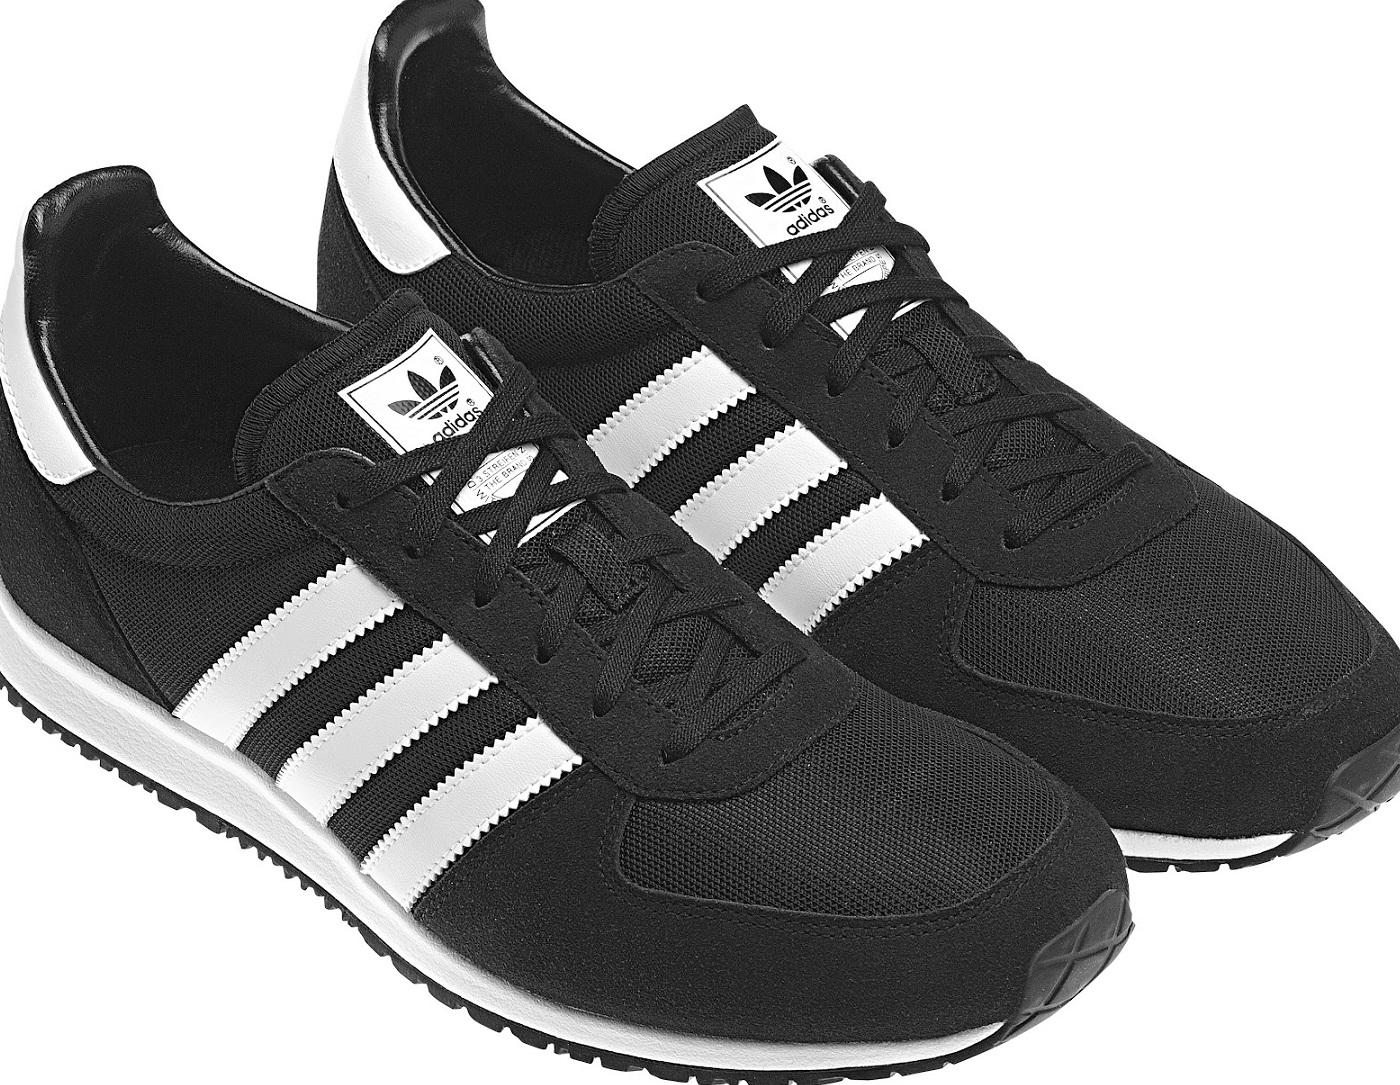 Siyah Samua Adidas Spor Ayakkab Modeli Erkek Ayakkabi Modelleri